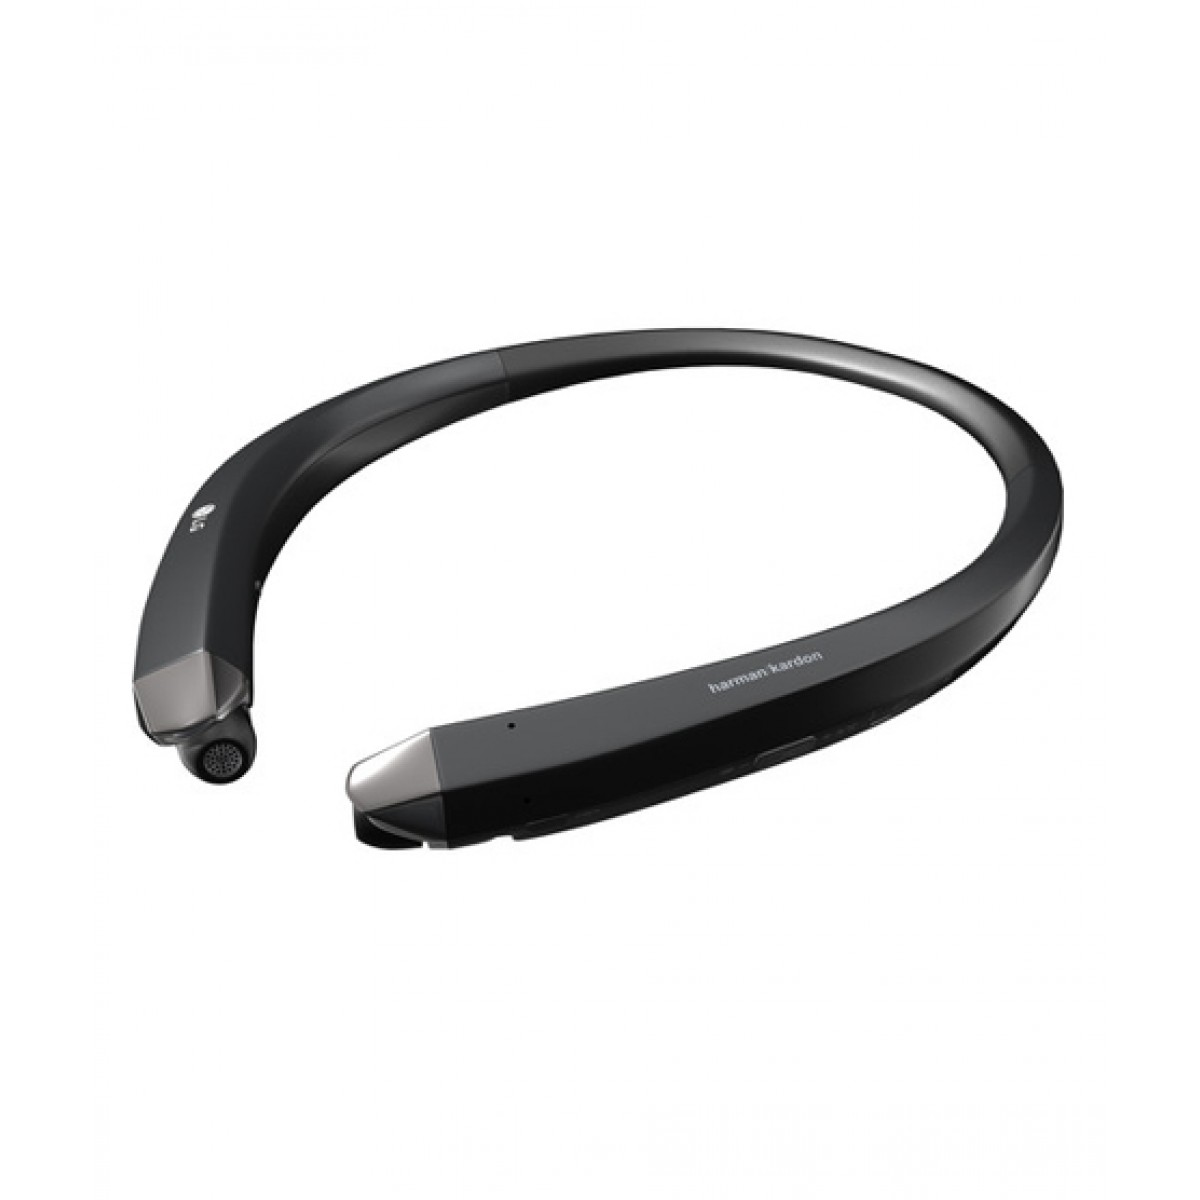 f106cbc8815 LG Tone Infinim Wireless Headset Price in Pakistan   Buy LG Tone Infinim Wireless  Stereo Headset (HBS-910)   iShopping.pk